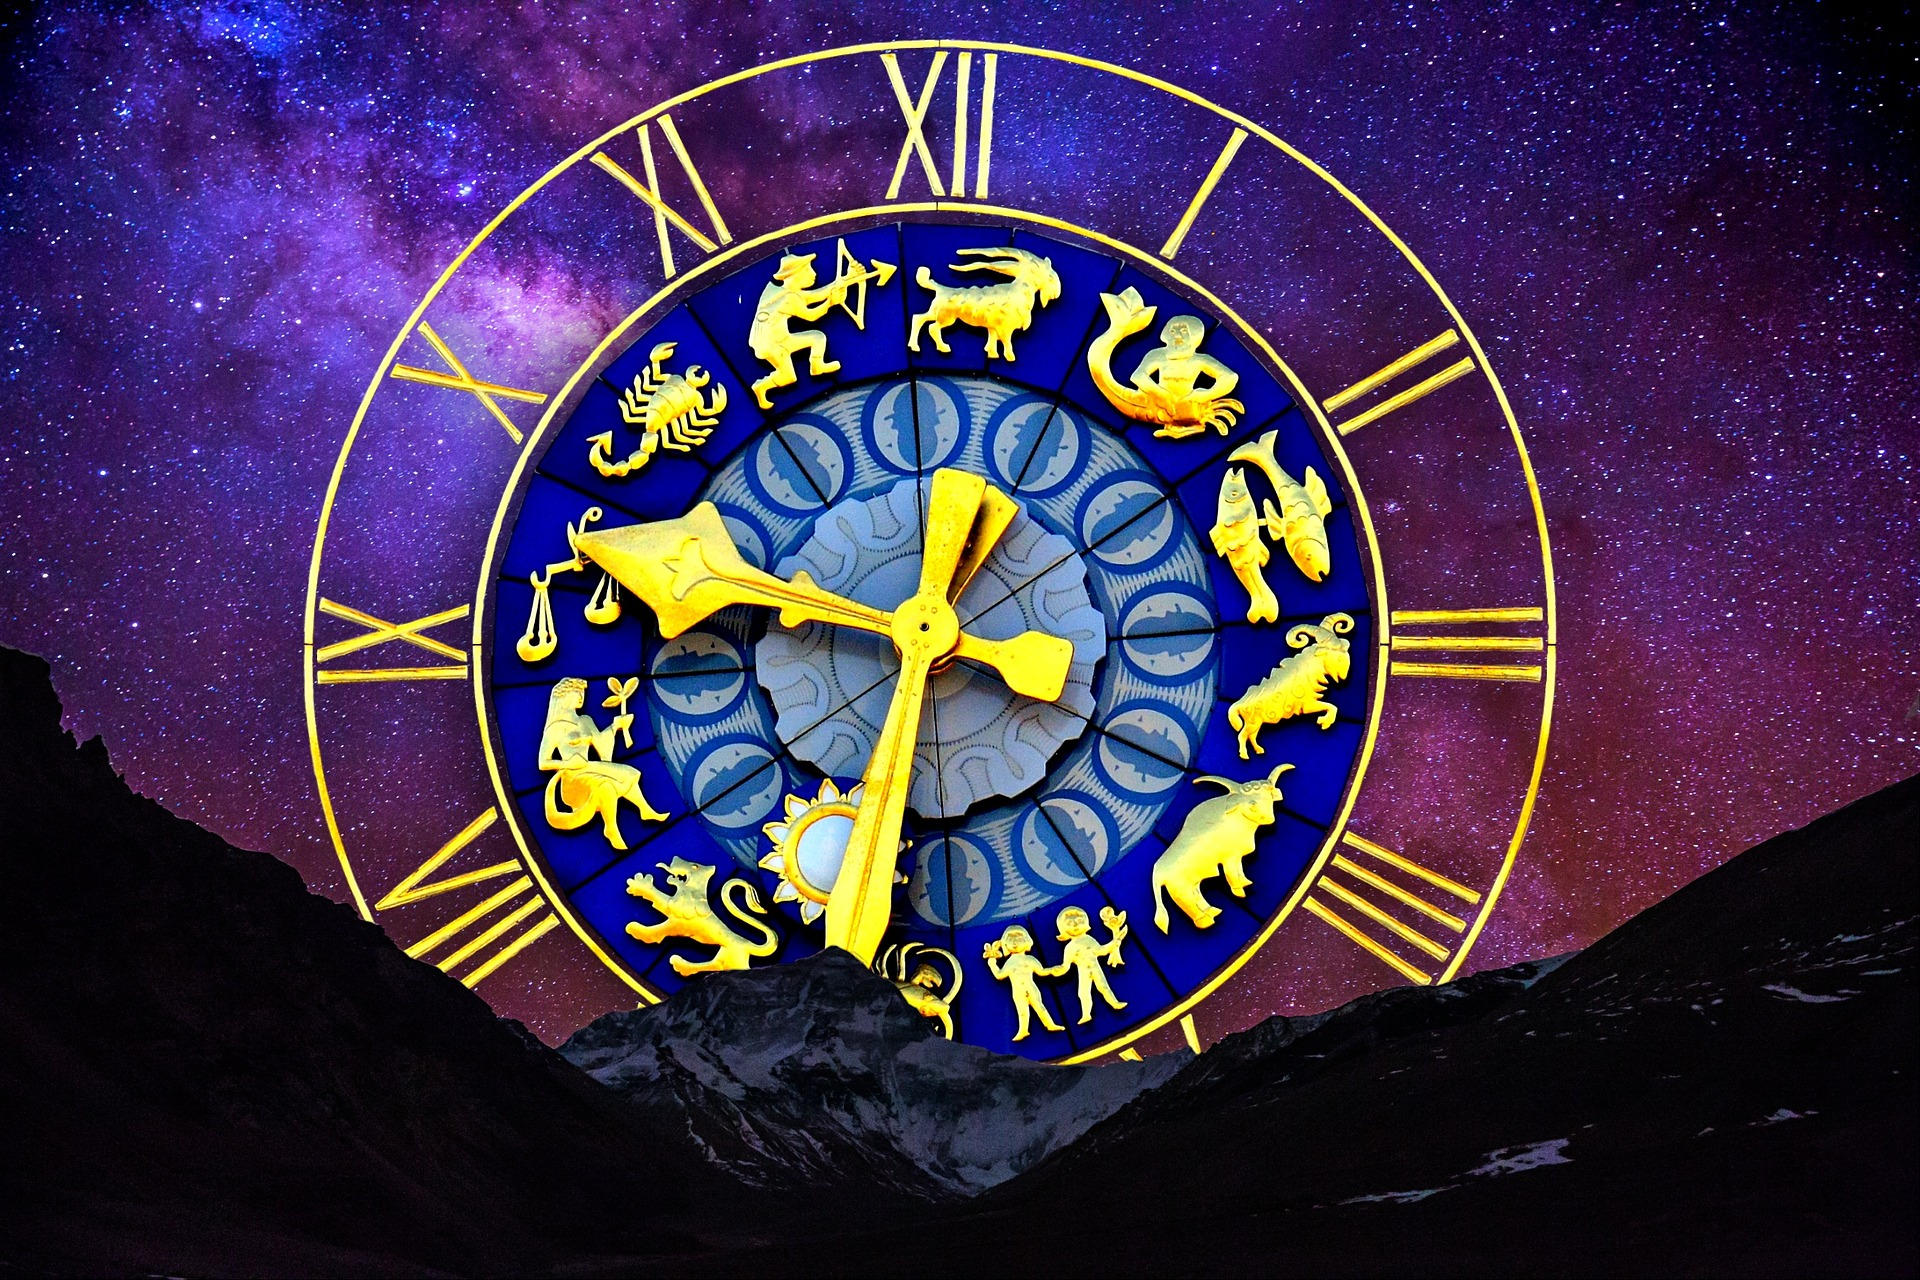 Horoscop zilnic: Horoscopul zilei pentru SAMBATA 17 NOIEMBRIE 2018. A inceput Mercur retrograd!